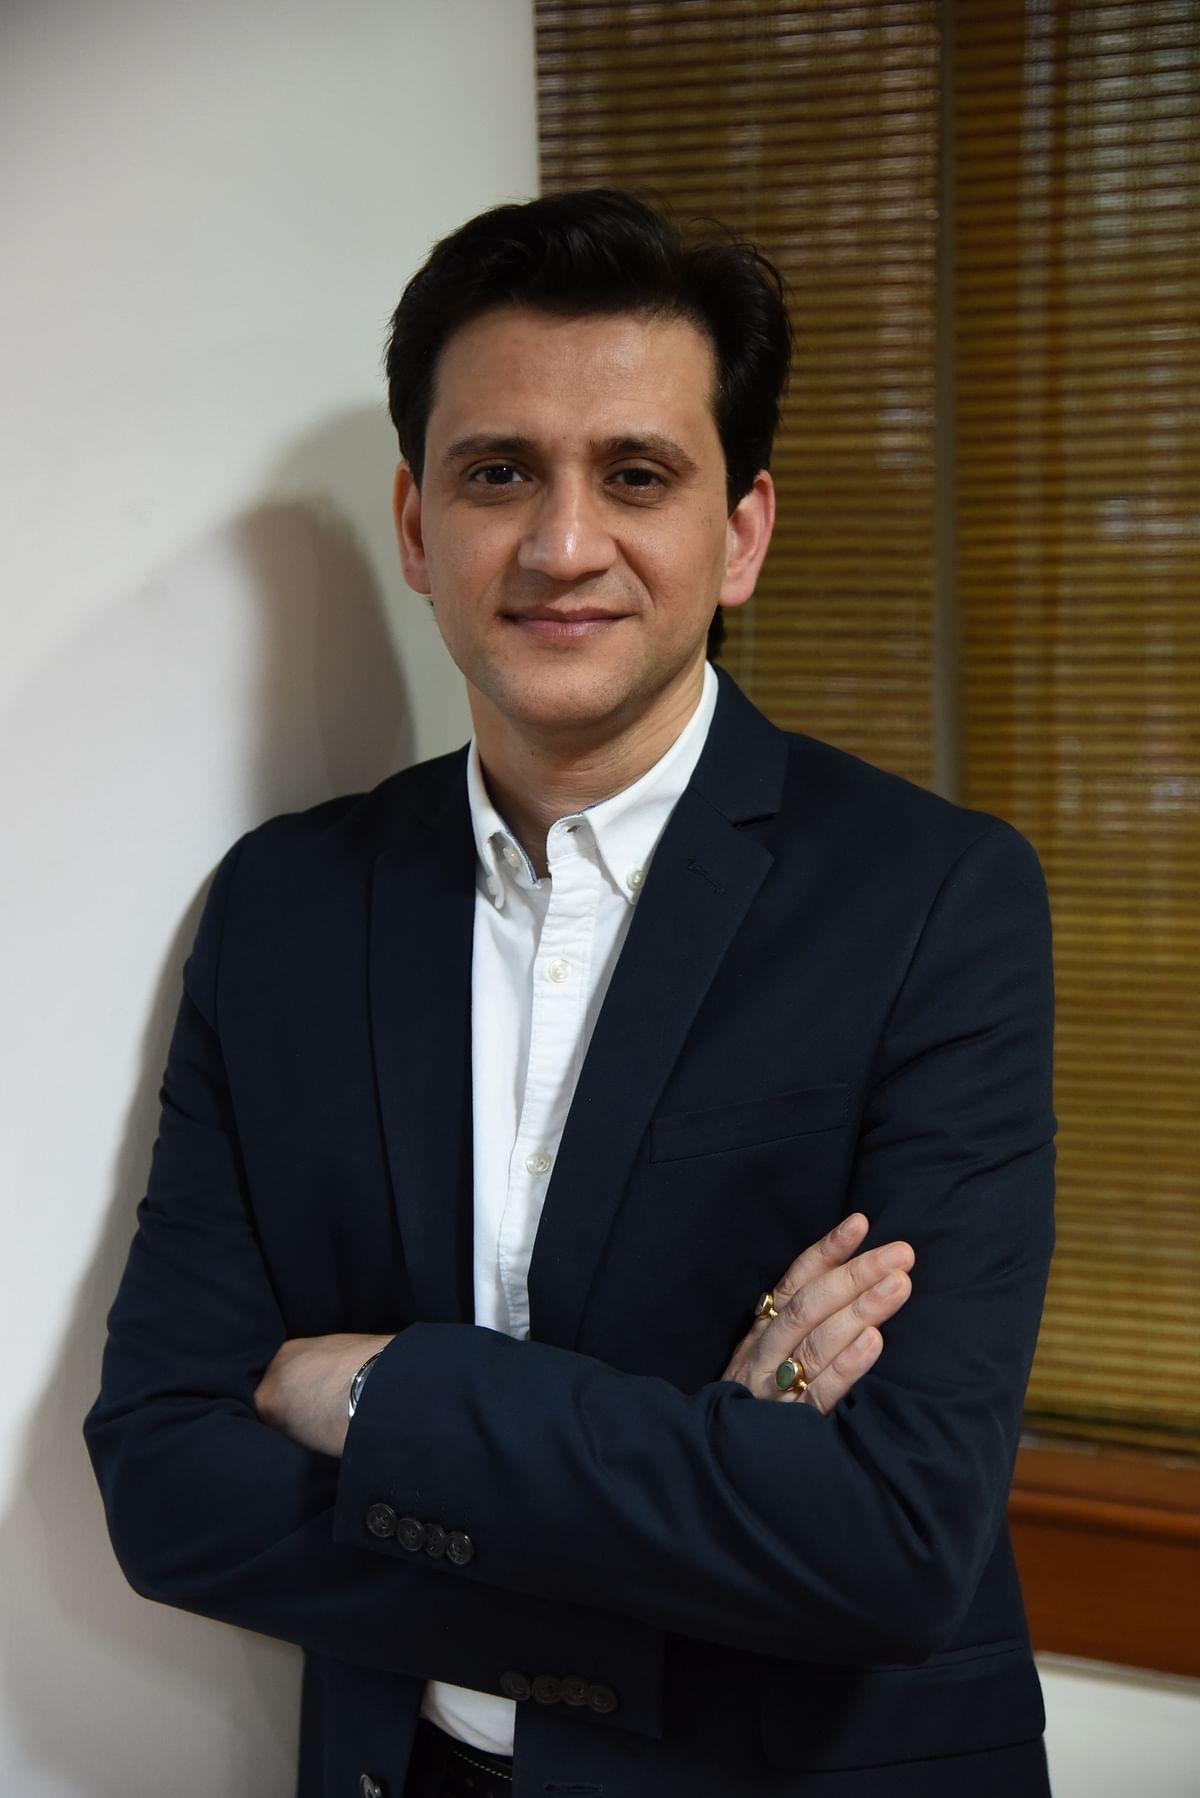 Rohit Kapoor - Director Marketing, Perfetti Van Melle India